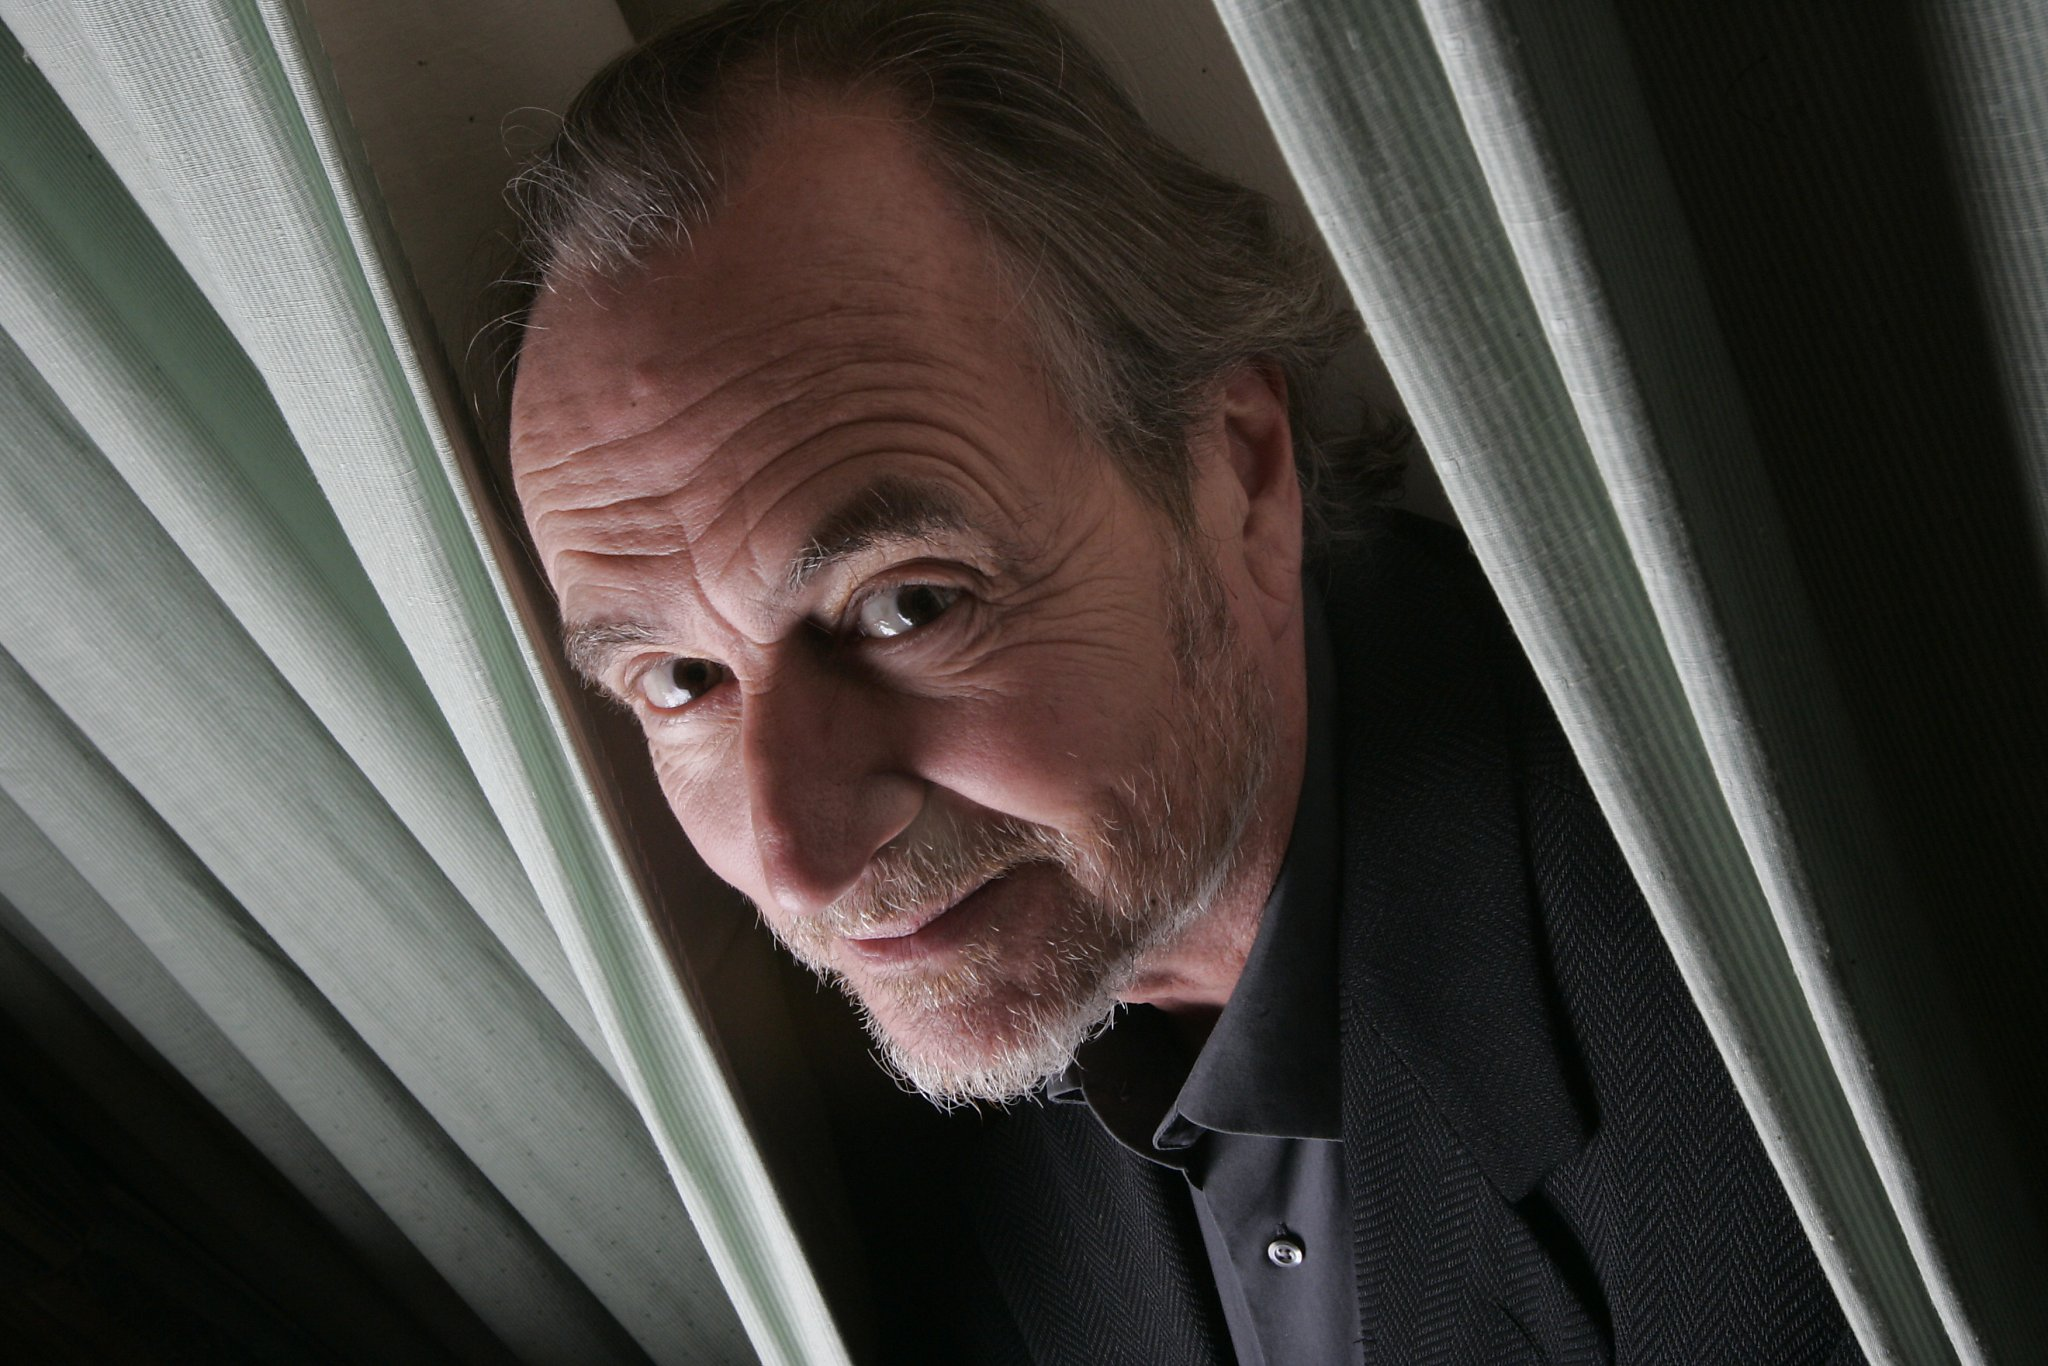 Wes craven hollywood horror master dead at 76 beaumont enterprise